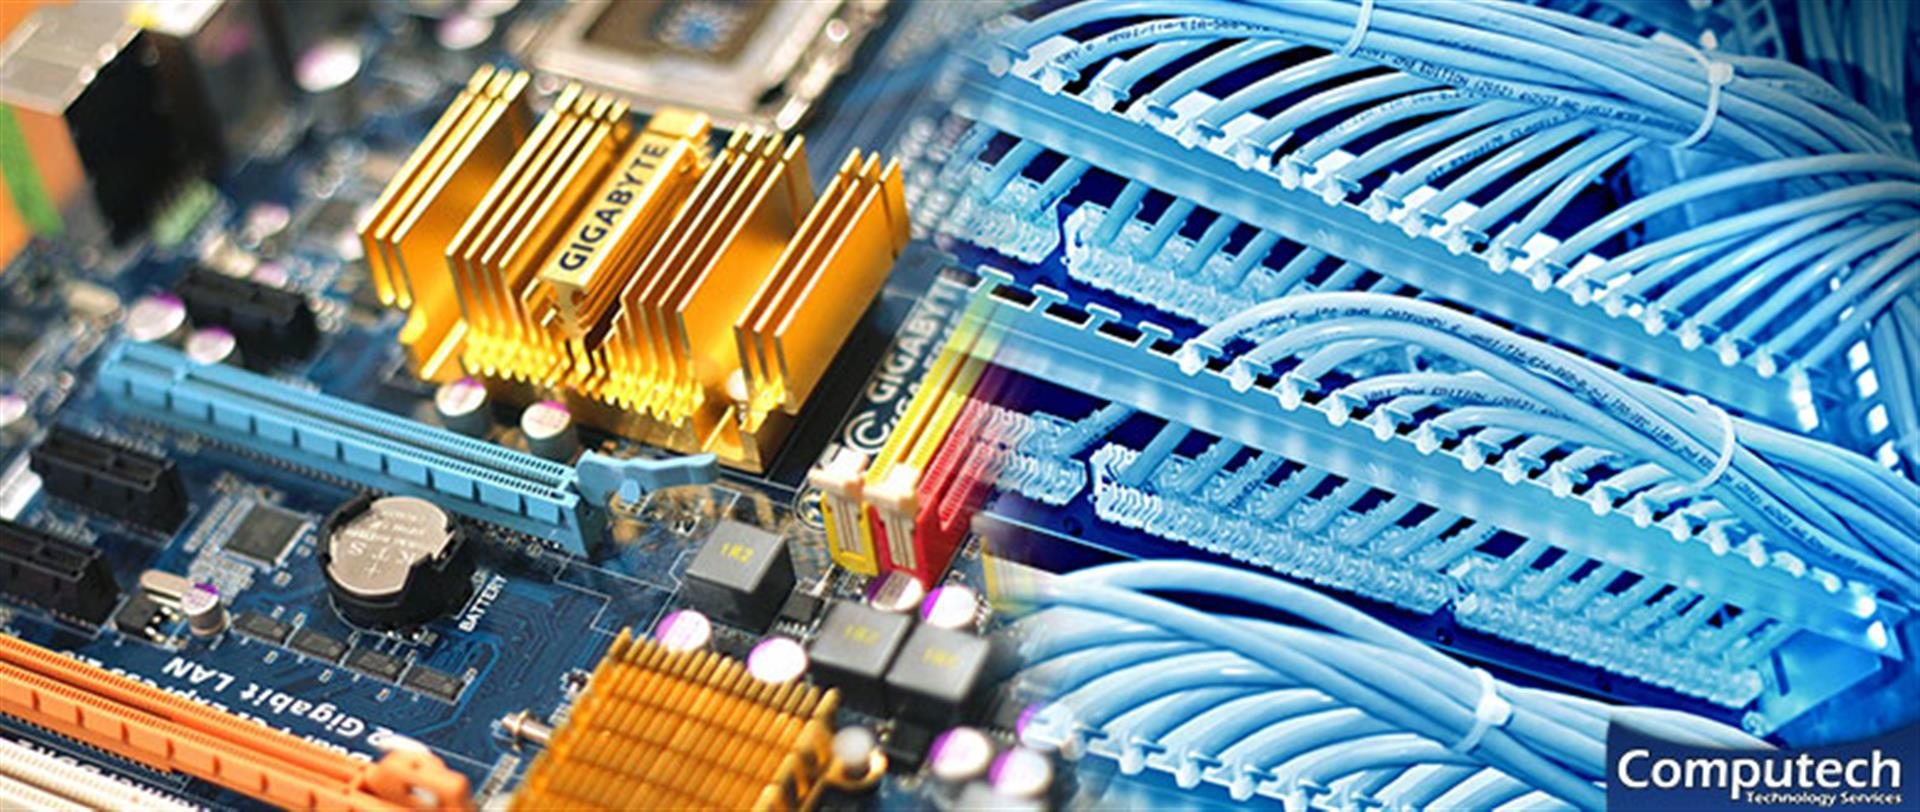 Adel Georgia On Site PC & Printer Repairs, Network, Voice & Data Cabling Contractors